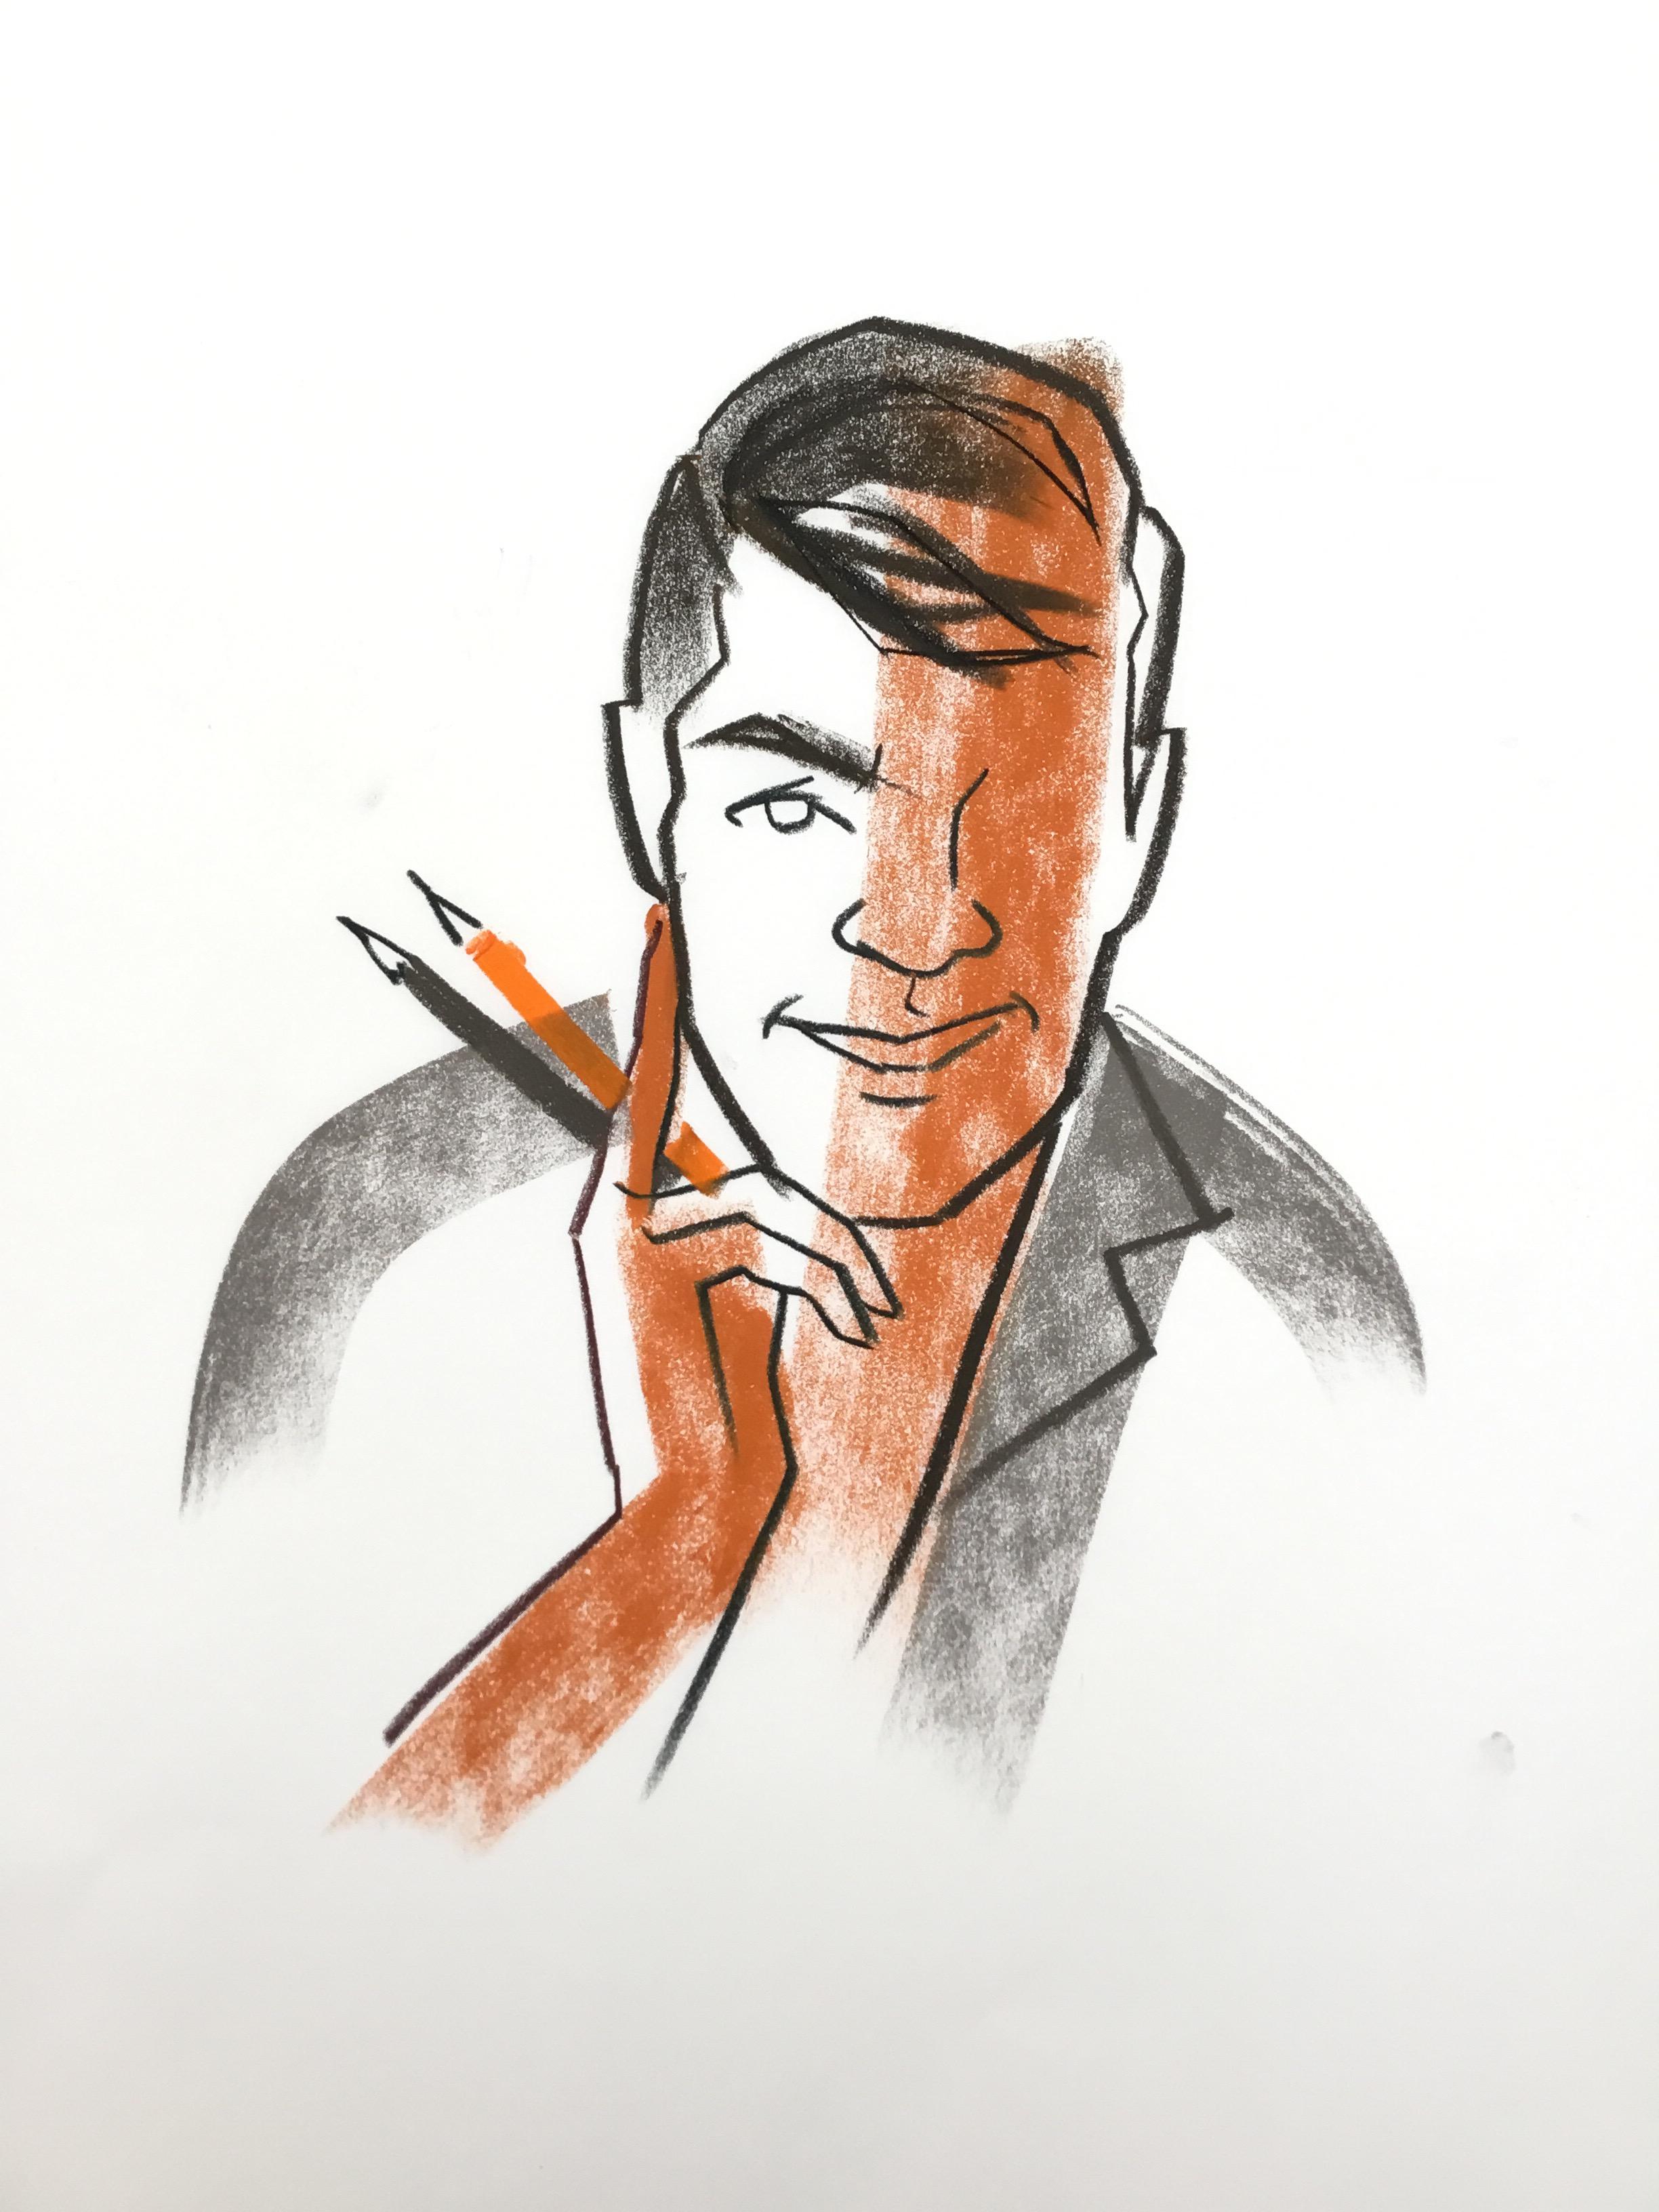 Leonard Cadiente - Self Portrait